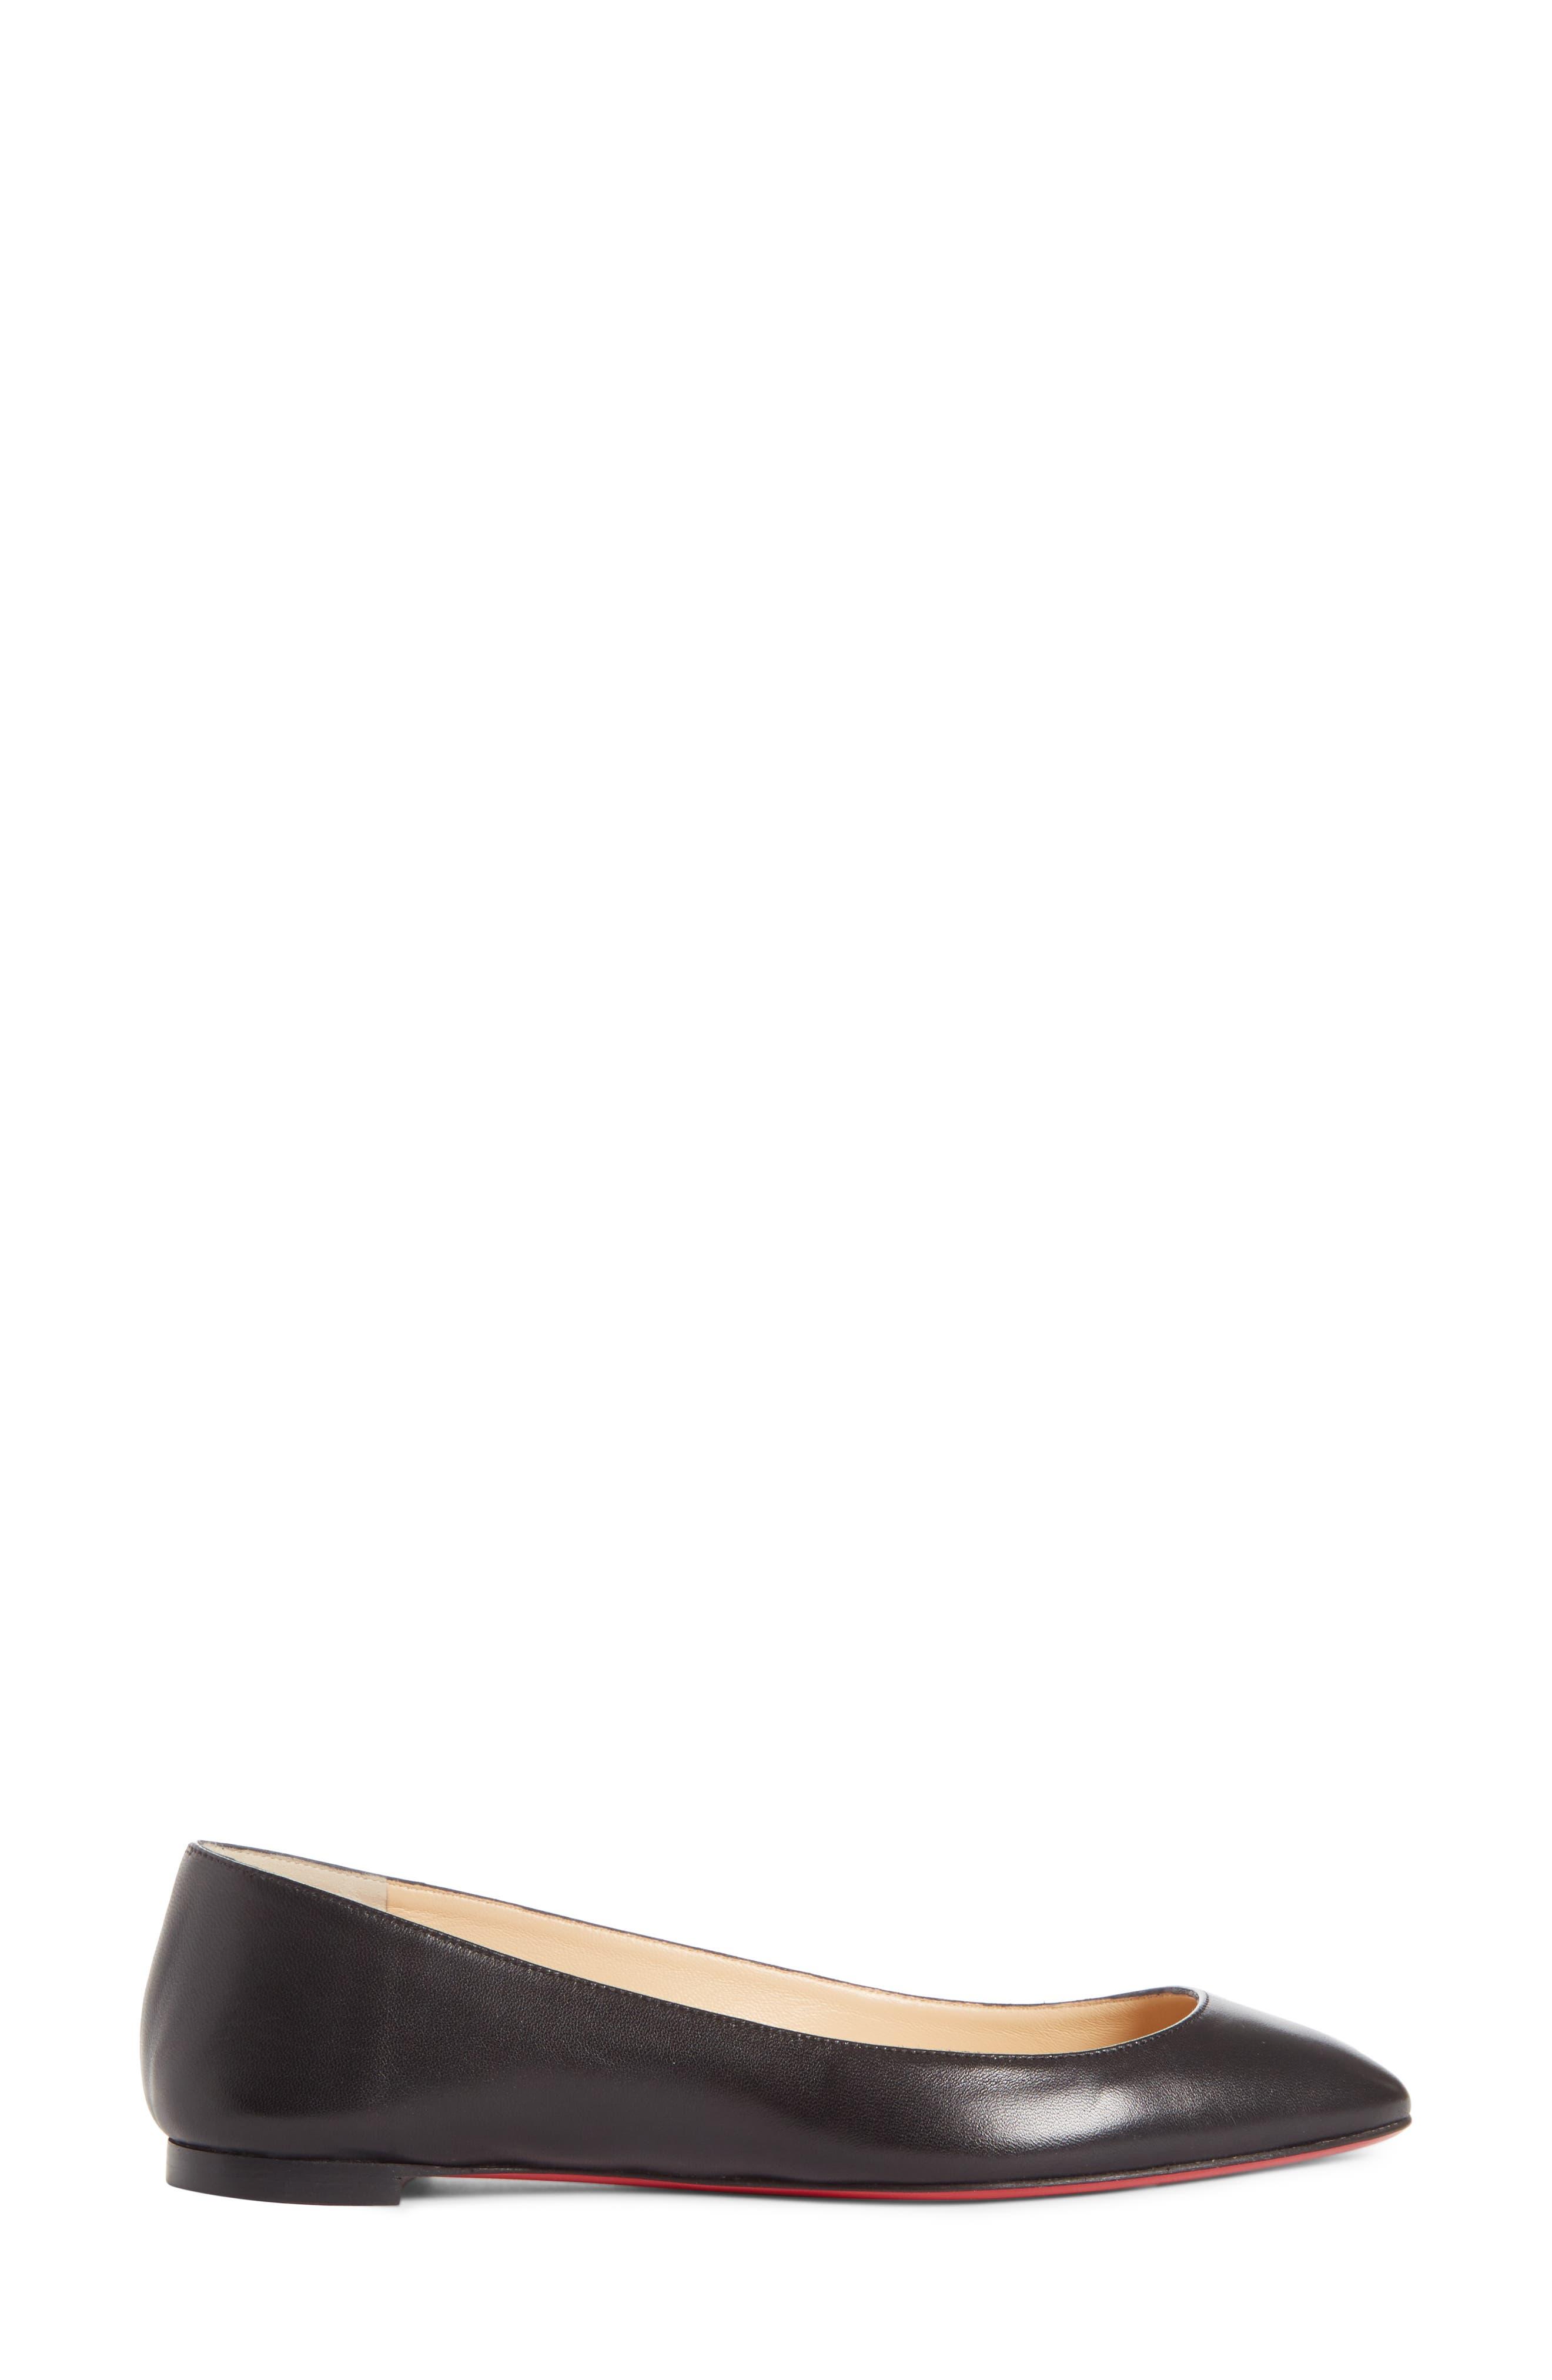 Eloise Flat,                             Alternate thumbnail 3, color,                             Black Leather